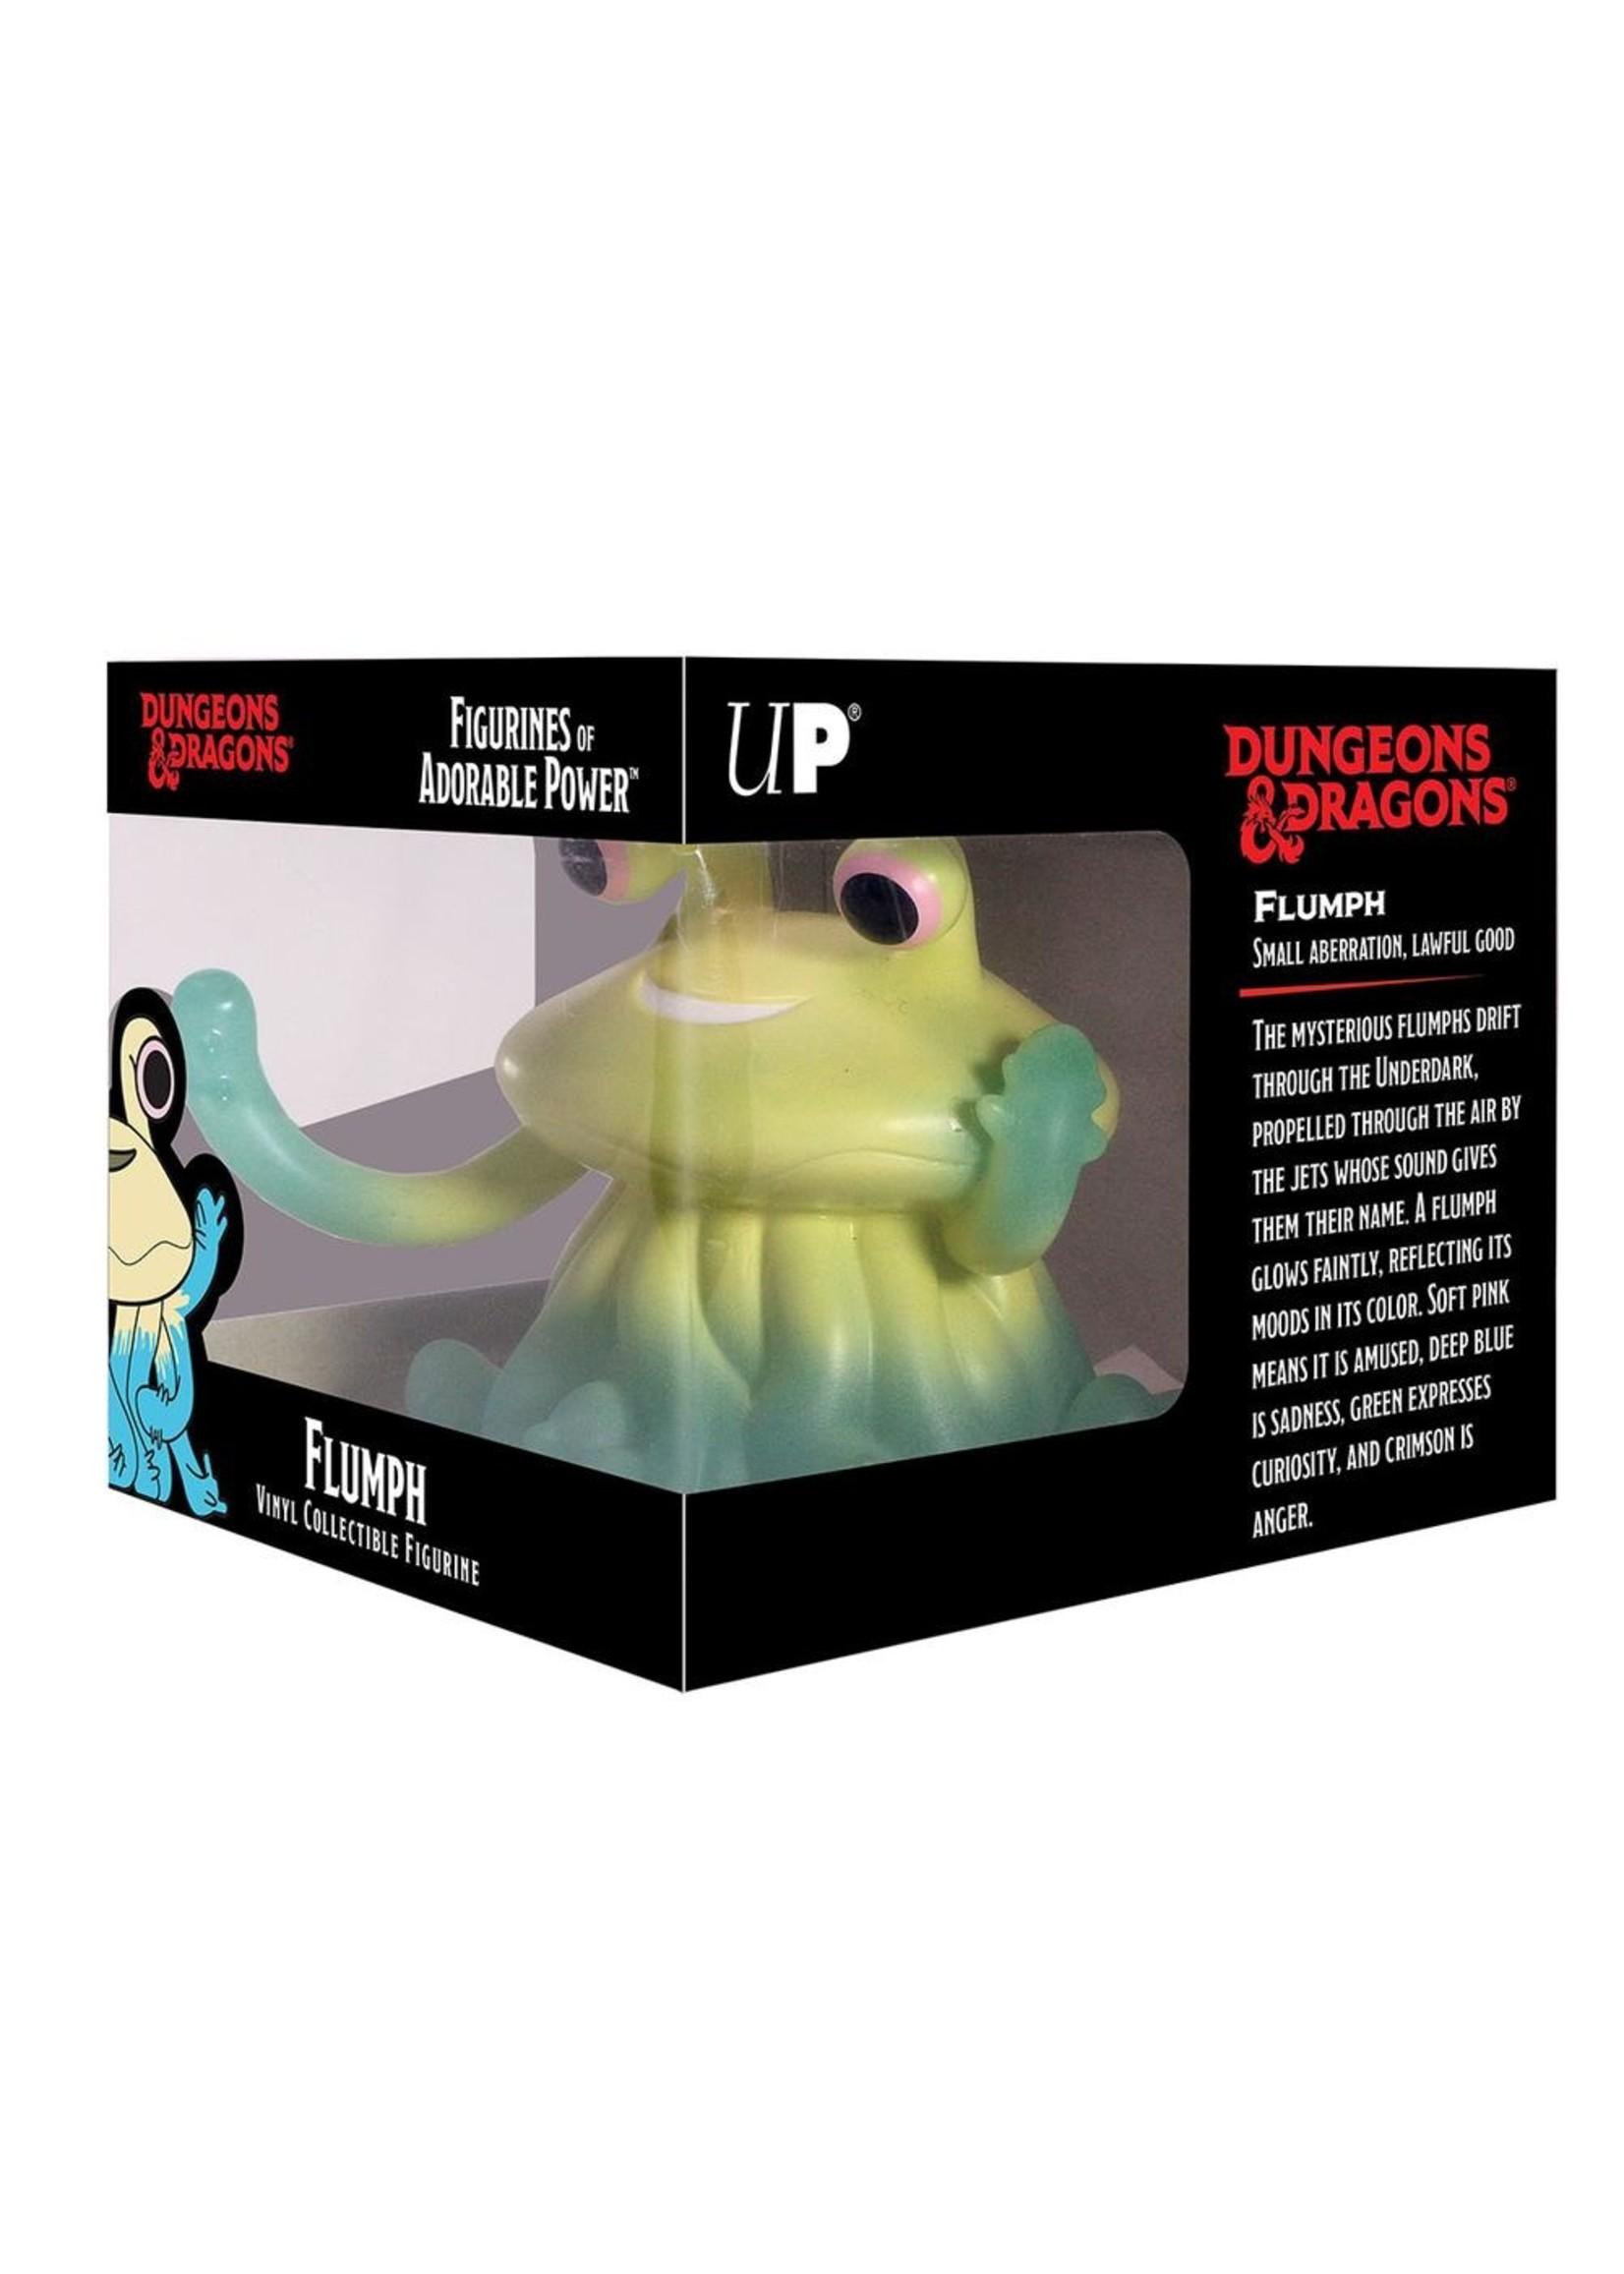 D&D Figurines of Adorable Power: Flumph